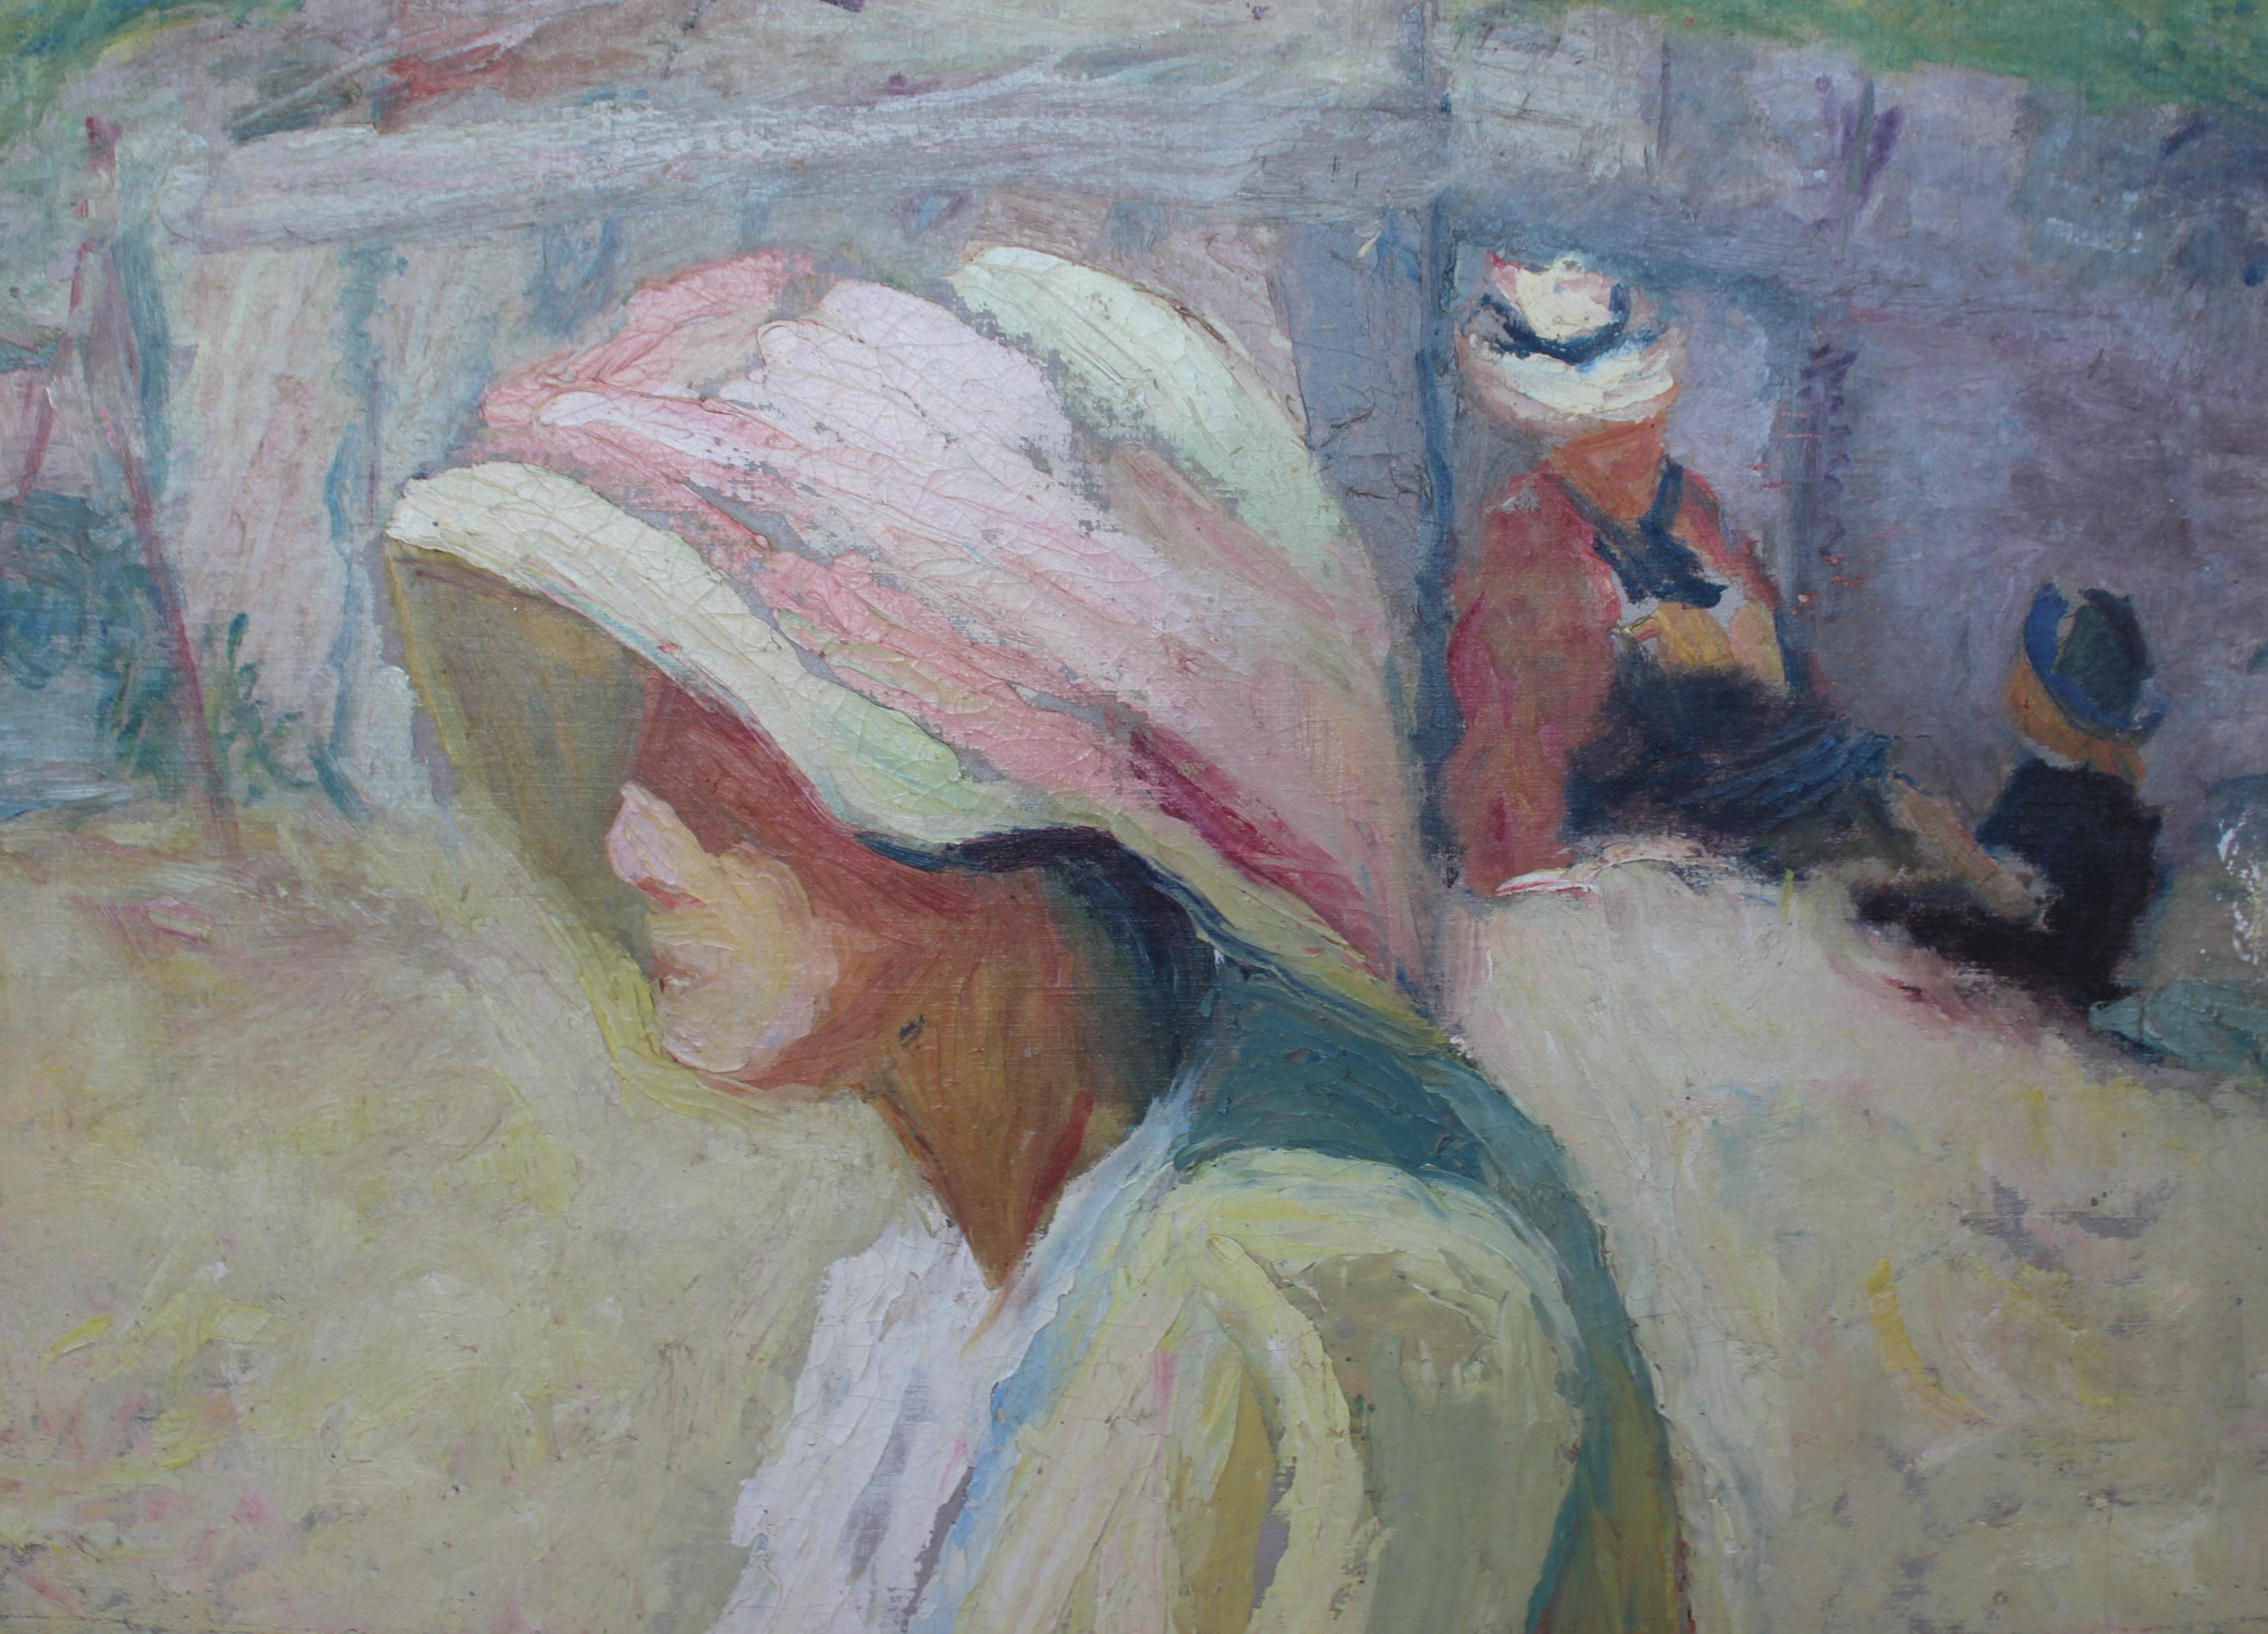 Louise Zaring